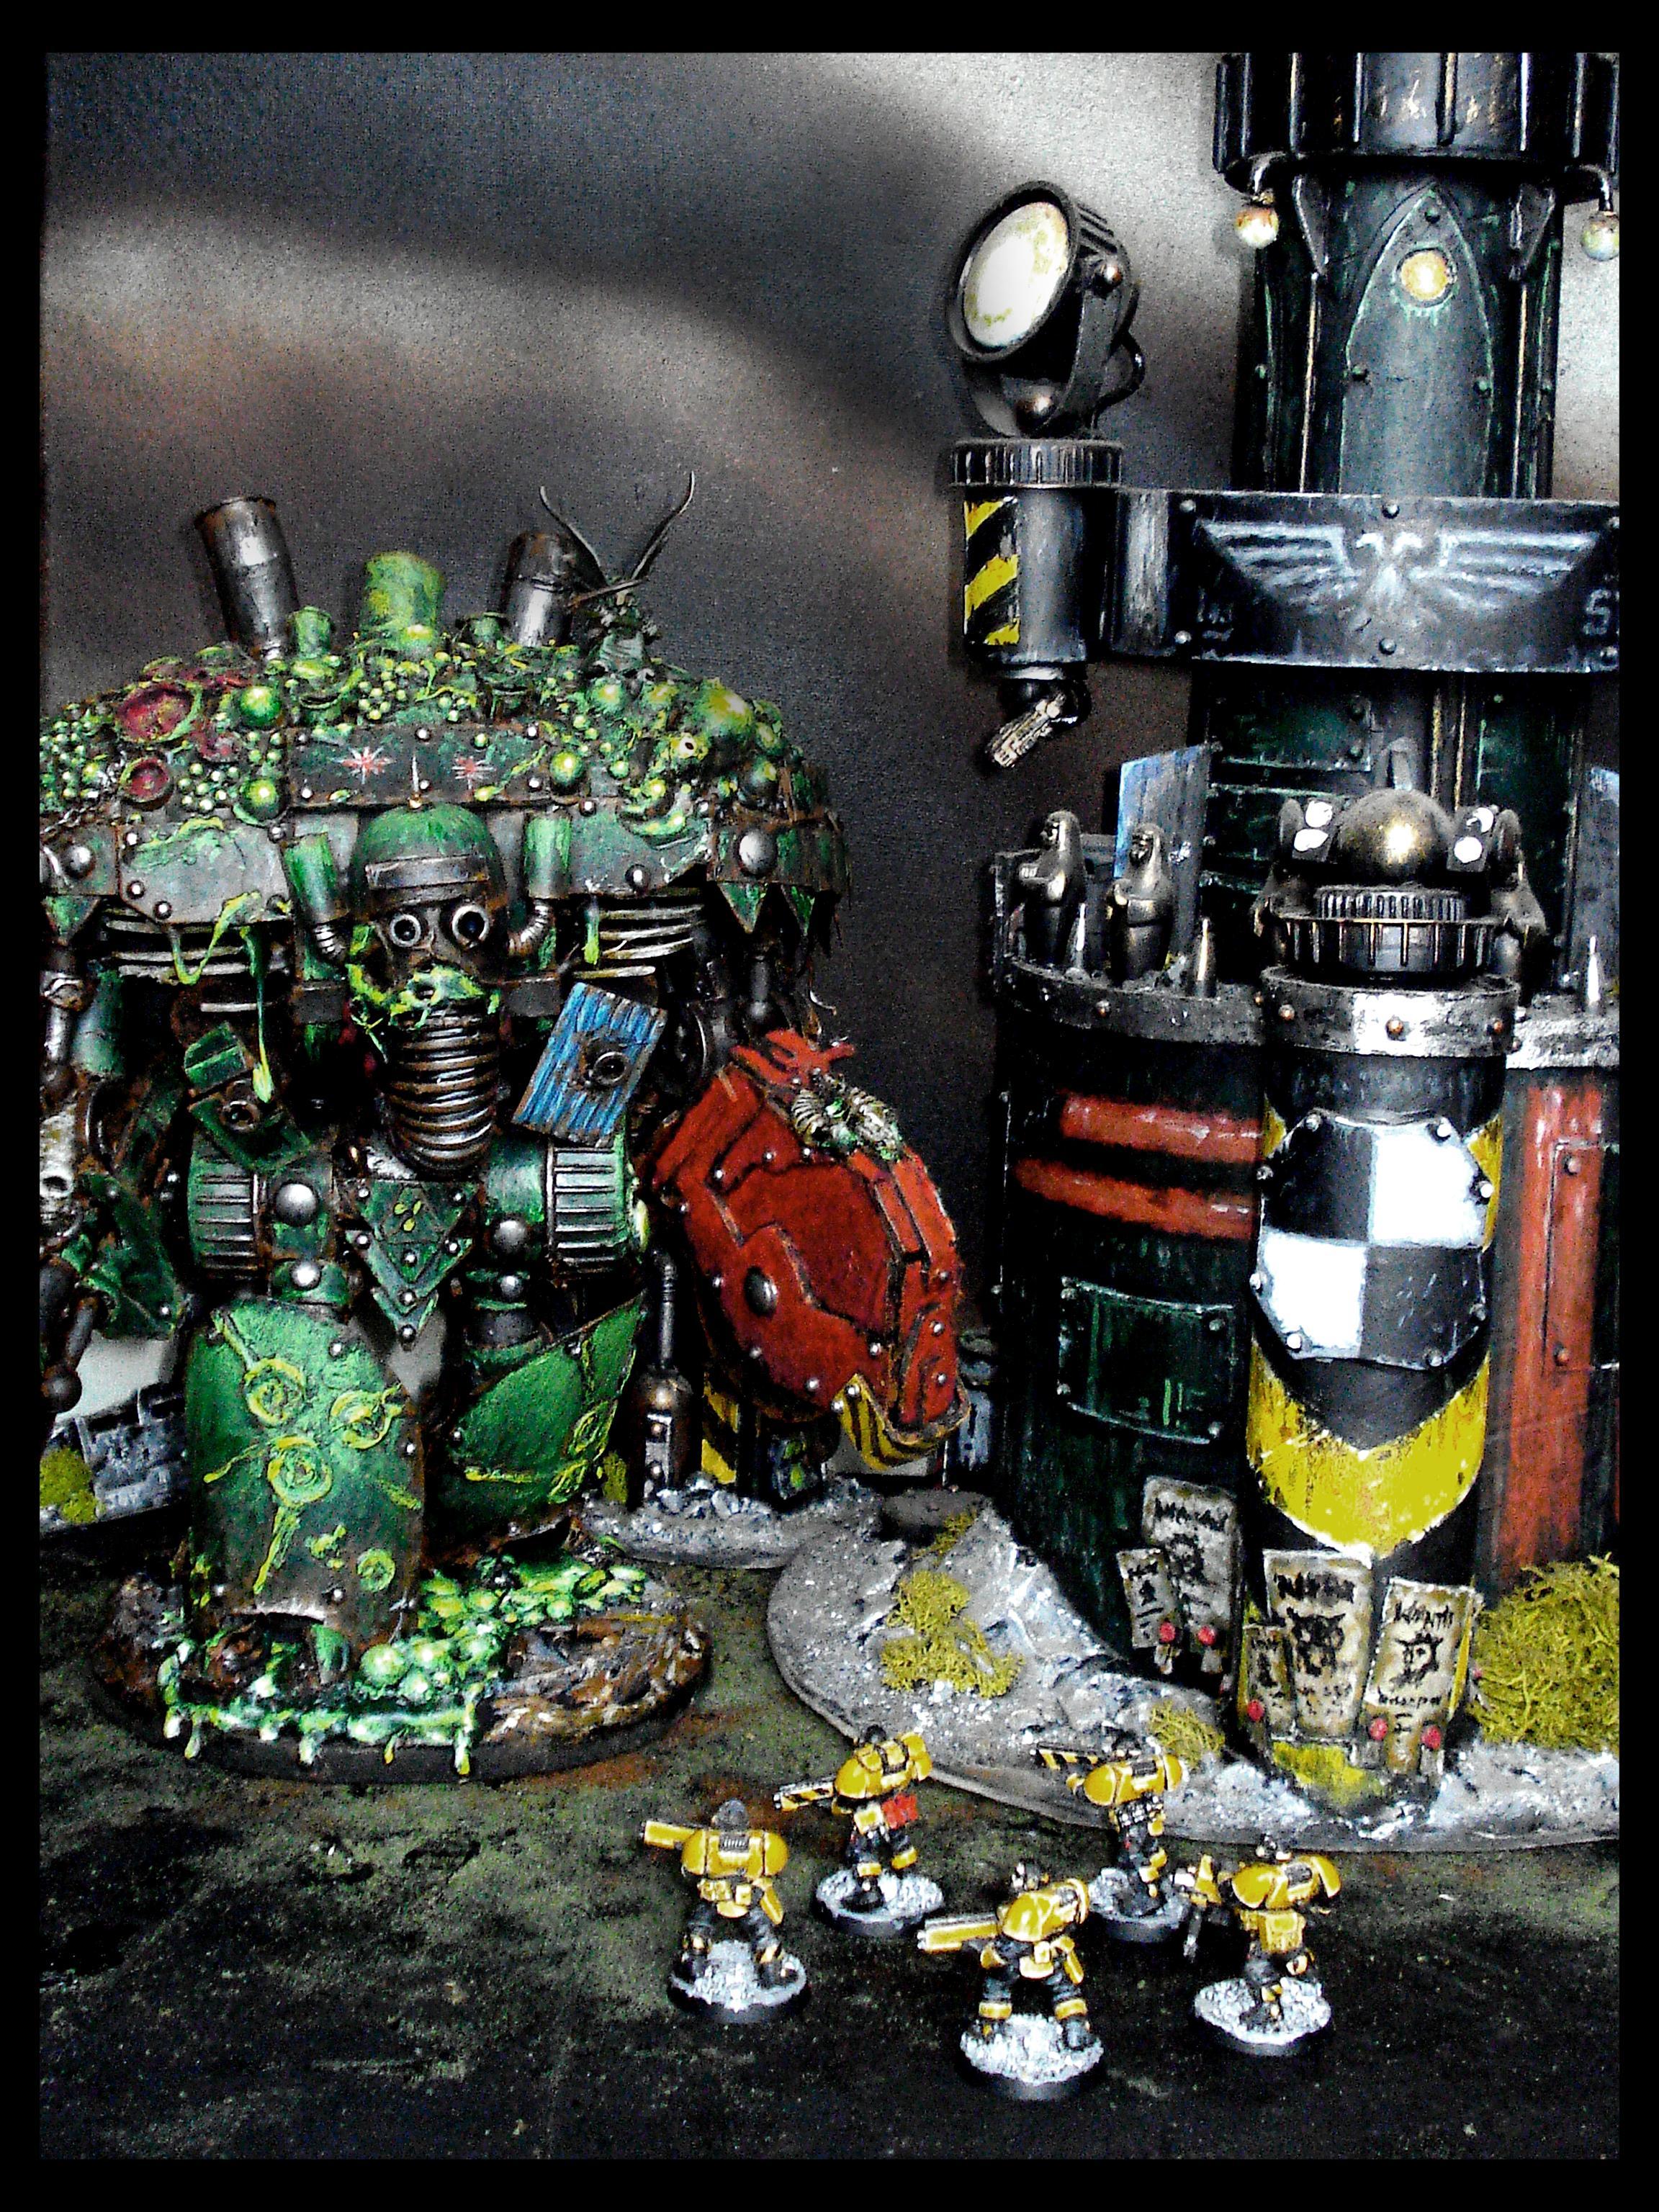 Chaos, Knights, Nurgle, Plague, Recycled, Scratch Build, Titan, Warhammer 40,000, Warhammer Fantasy